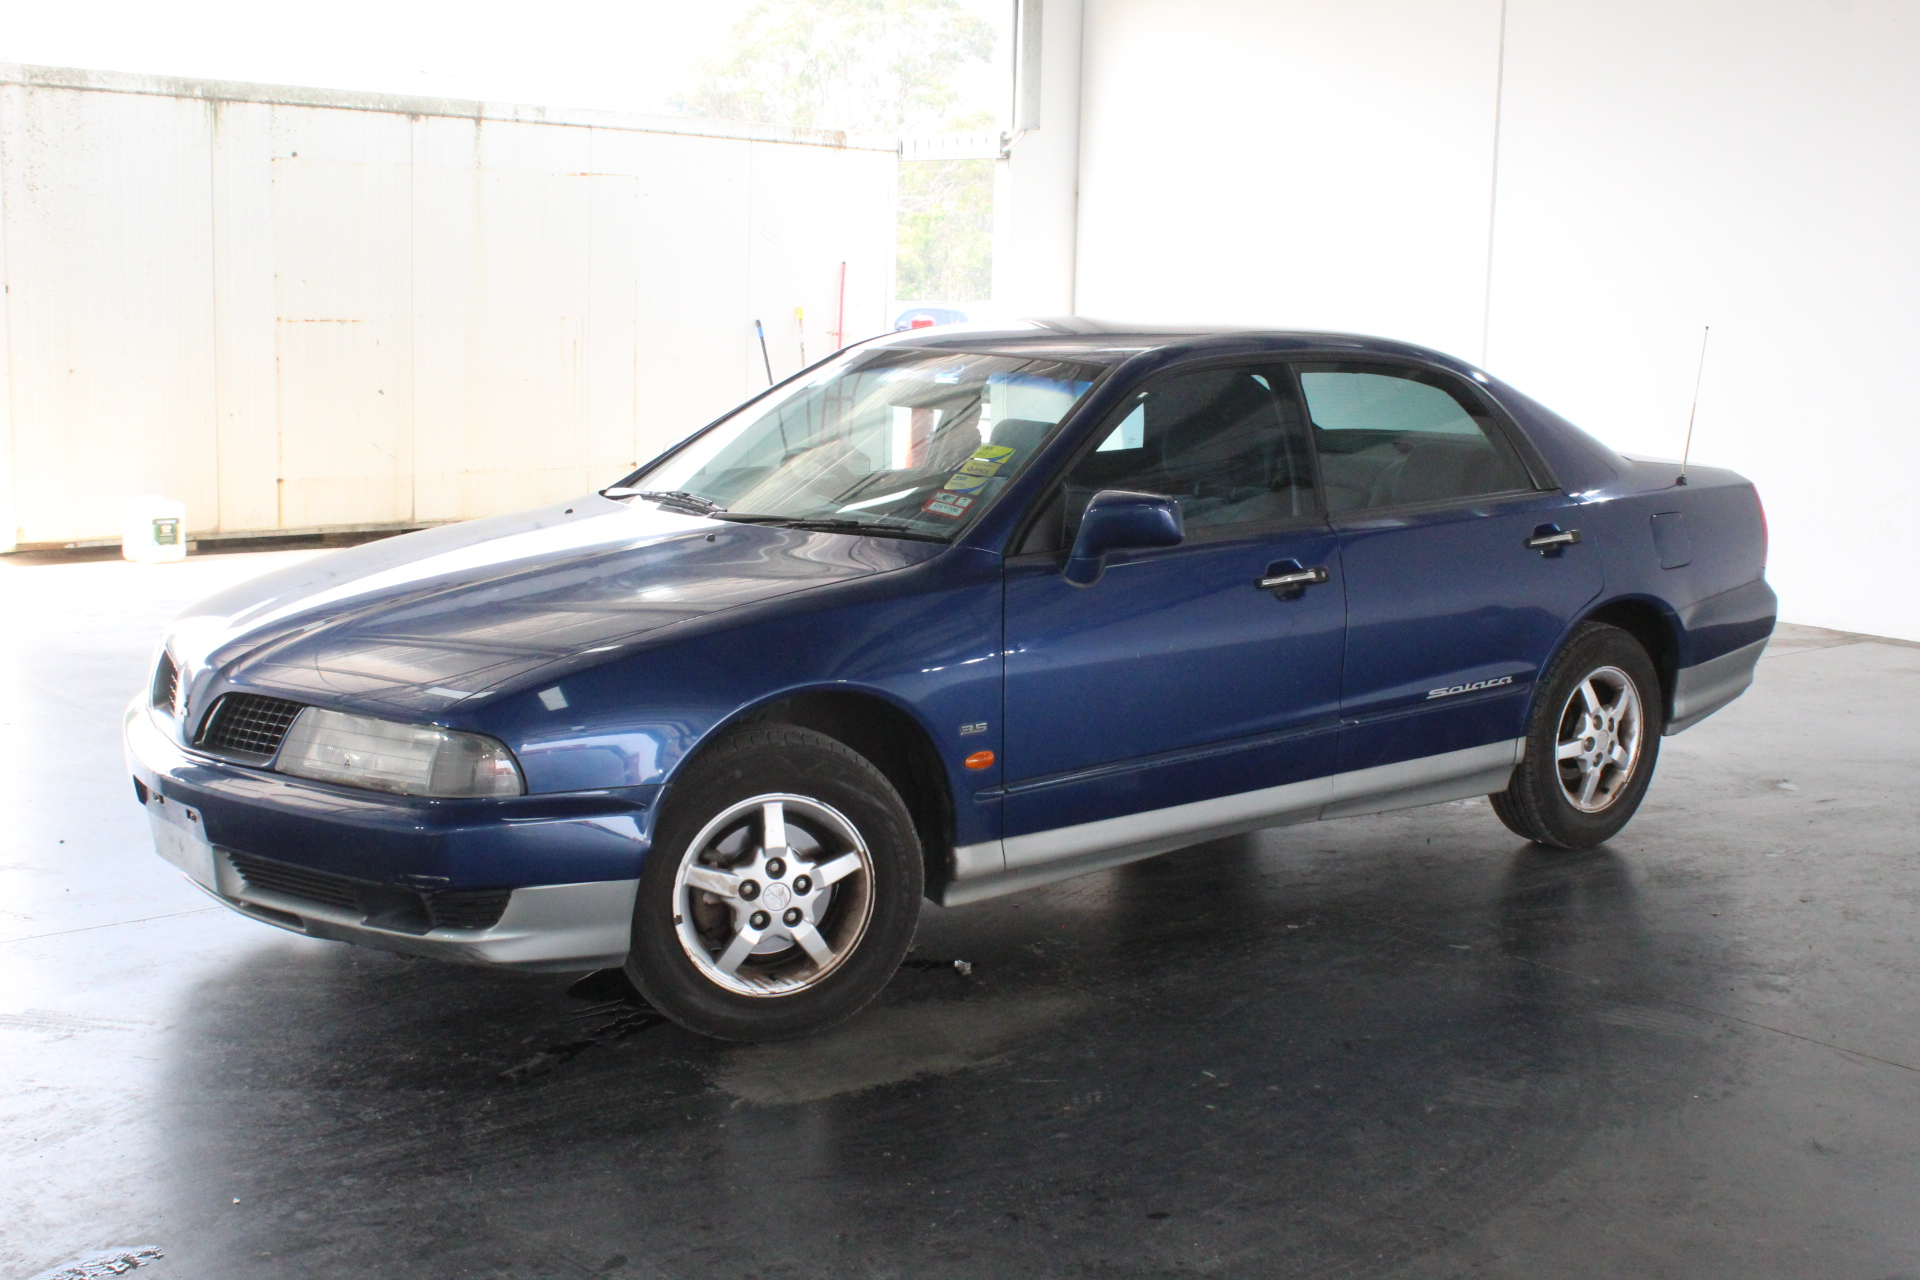 2001 Mitsubishi Magna Advance TJ II Automatic Sedan